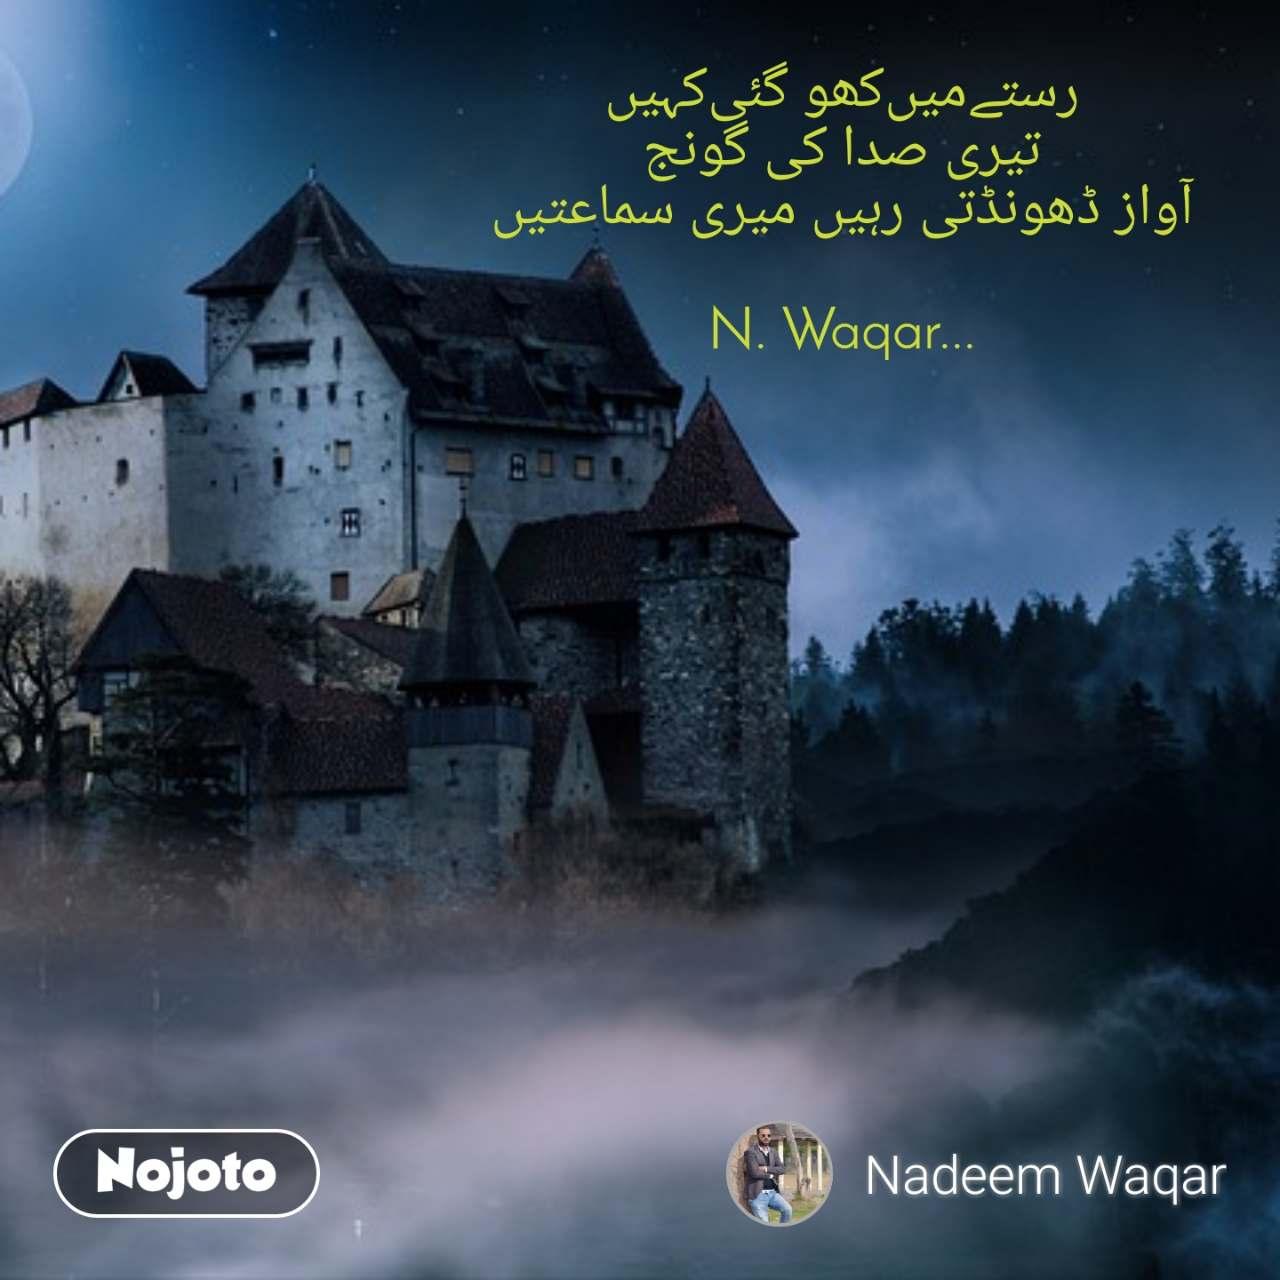 ﺭﺳﺘﮯﻣﯿﮟﮐﮭﻮ ﮔﺌﯽﮐﮩﯿﮟ ﺗﯿﺮﯼ ﺻﺪﺍ ﮐﯽ ﮔﻮﻧﺞ ﺁﻭﺍﺯ ﮈﮬﻮﻧﮉﺗﯽ ﺭﮨﯿﮟ ﻣﯿﺮﯼ ﺳﻤﺎﻋﺘﯿﮟ  N. Waqar...